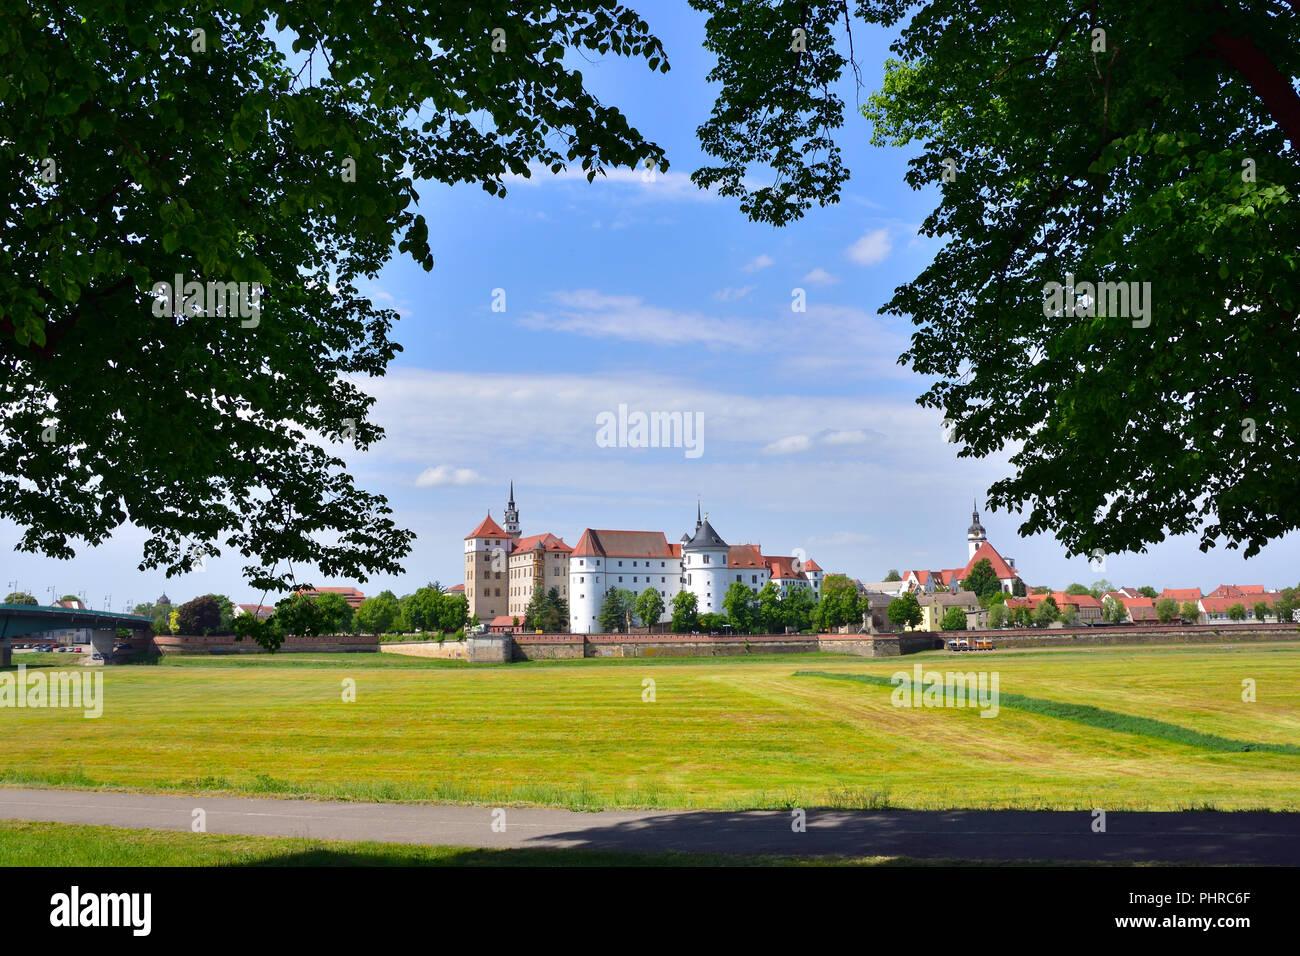 Castle Hartenfels in Torgau Stock Photo